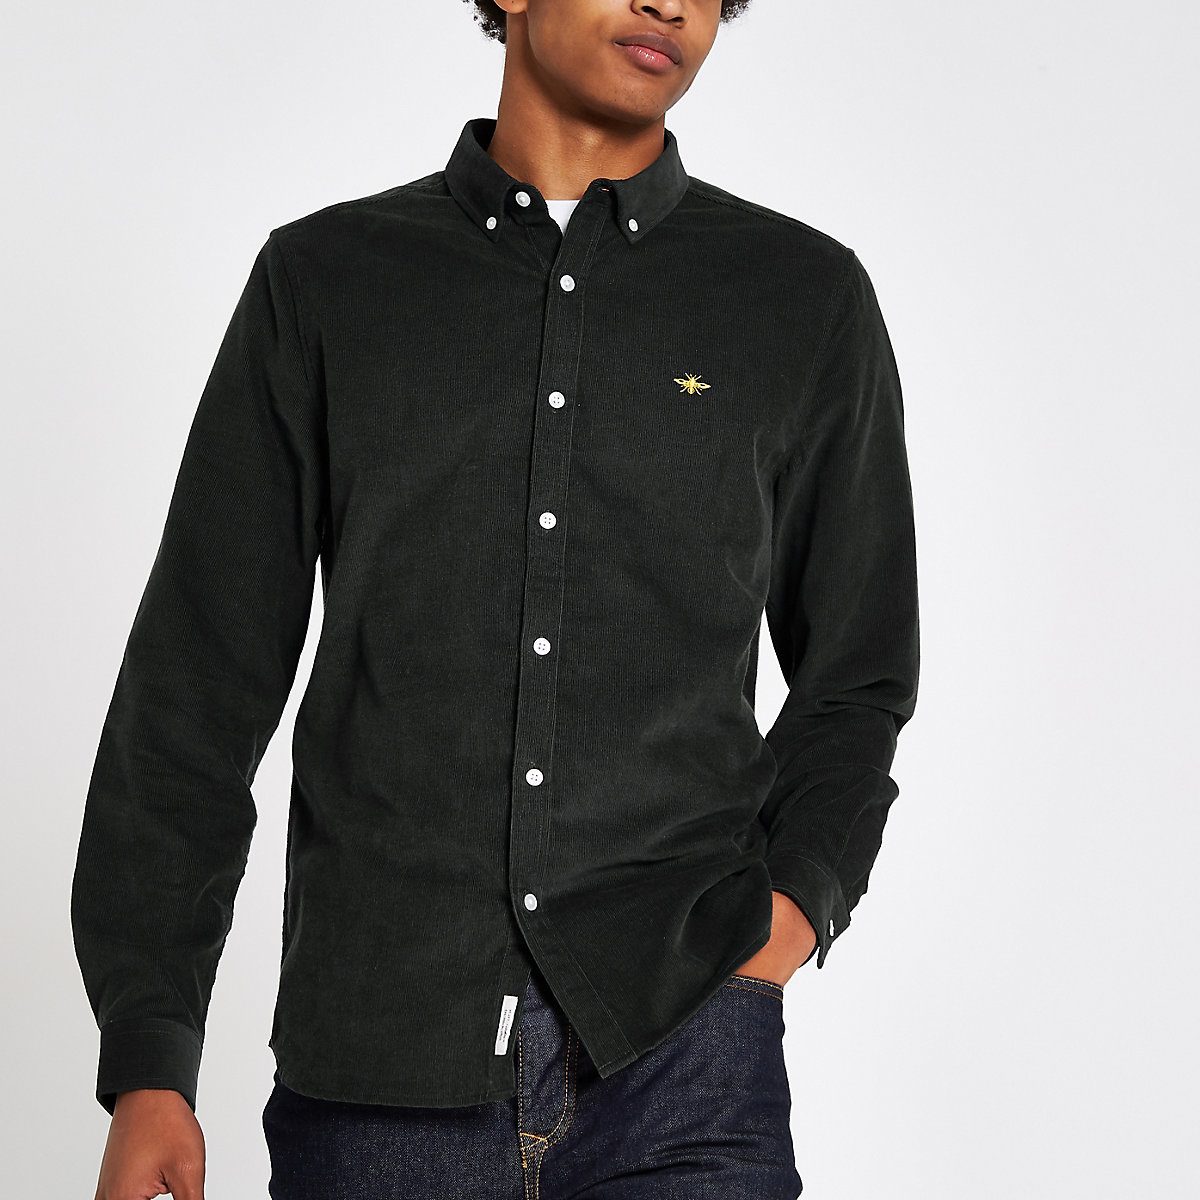 Dark green cord long sleeve button-down shirt